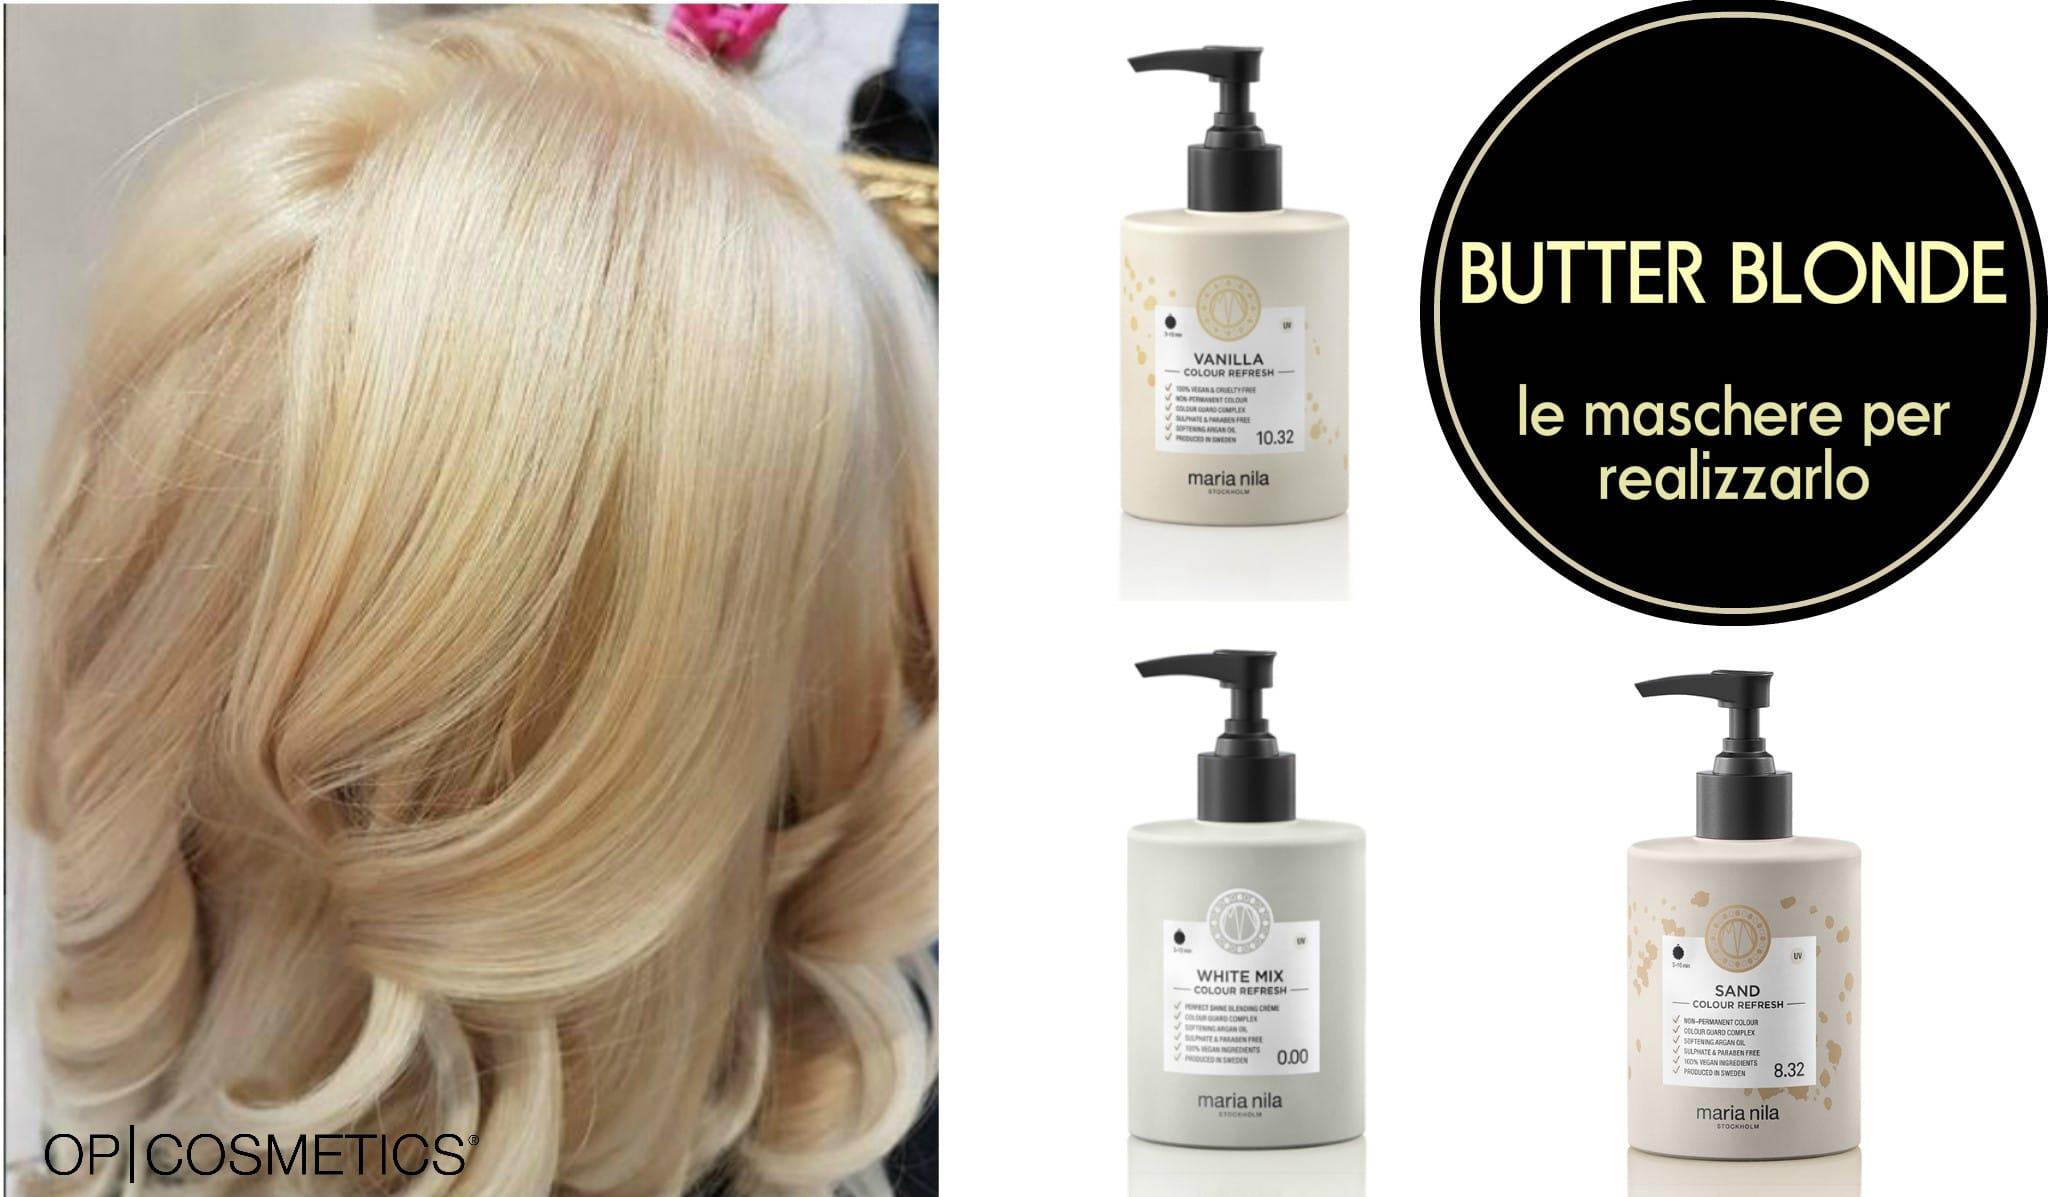 butter blonde capelli maschera